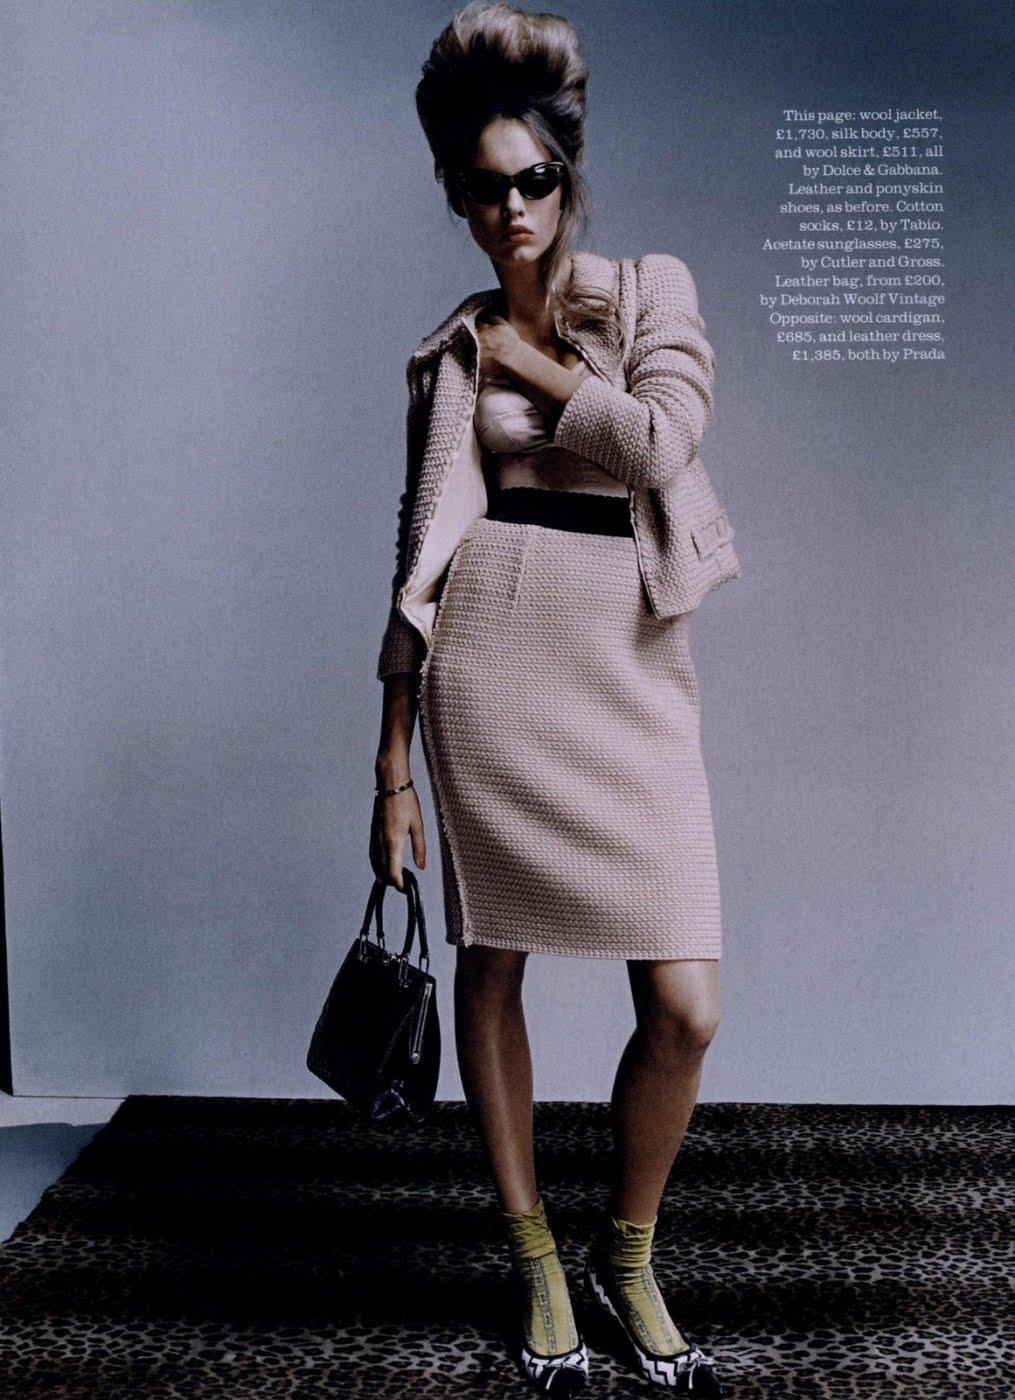 a880da40c1ba Alana Kuznetsova by David Slijper for Elle UK September 2010